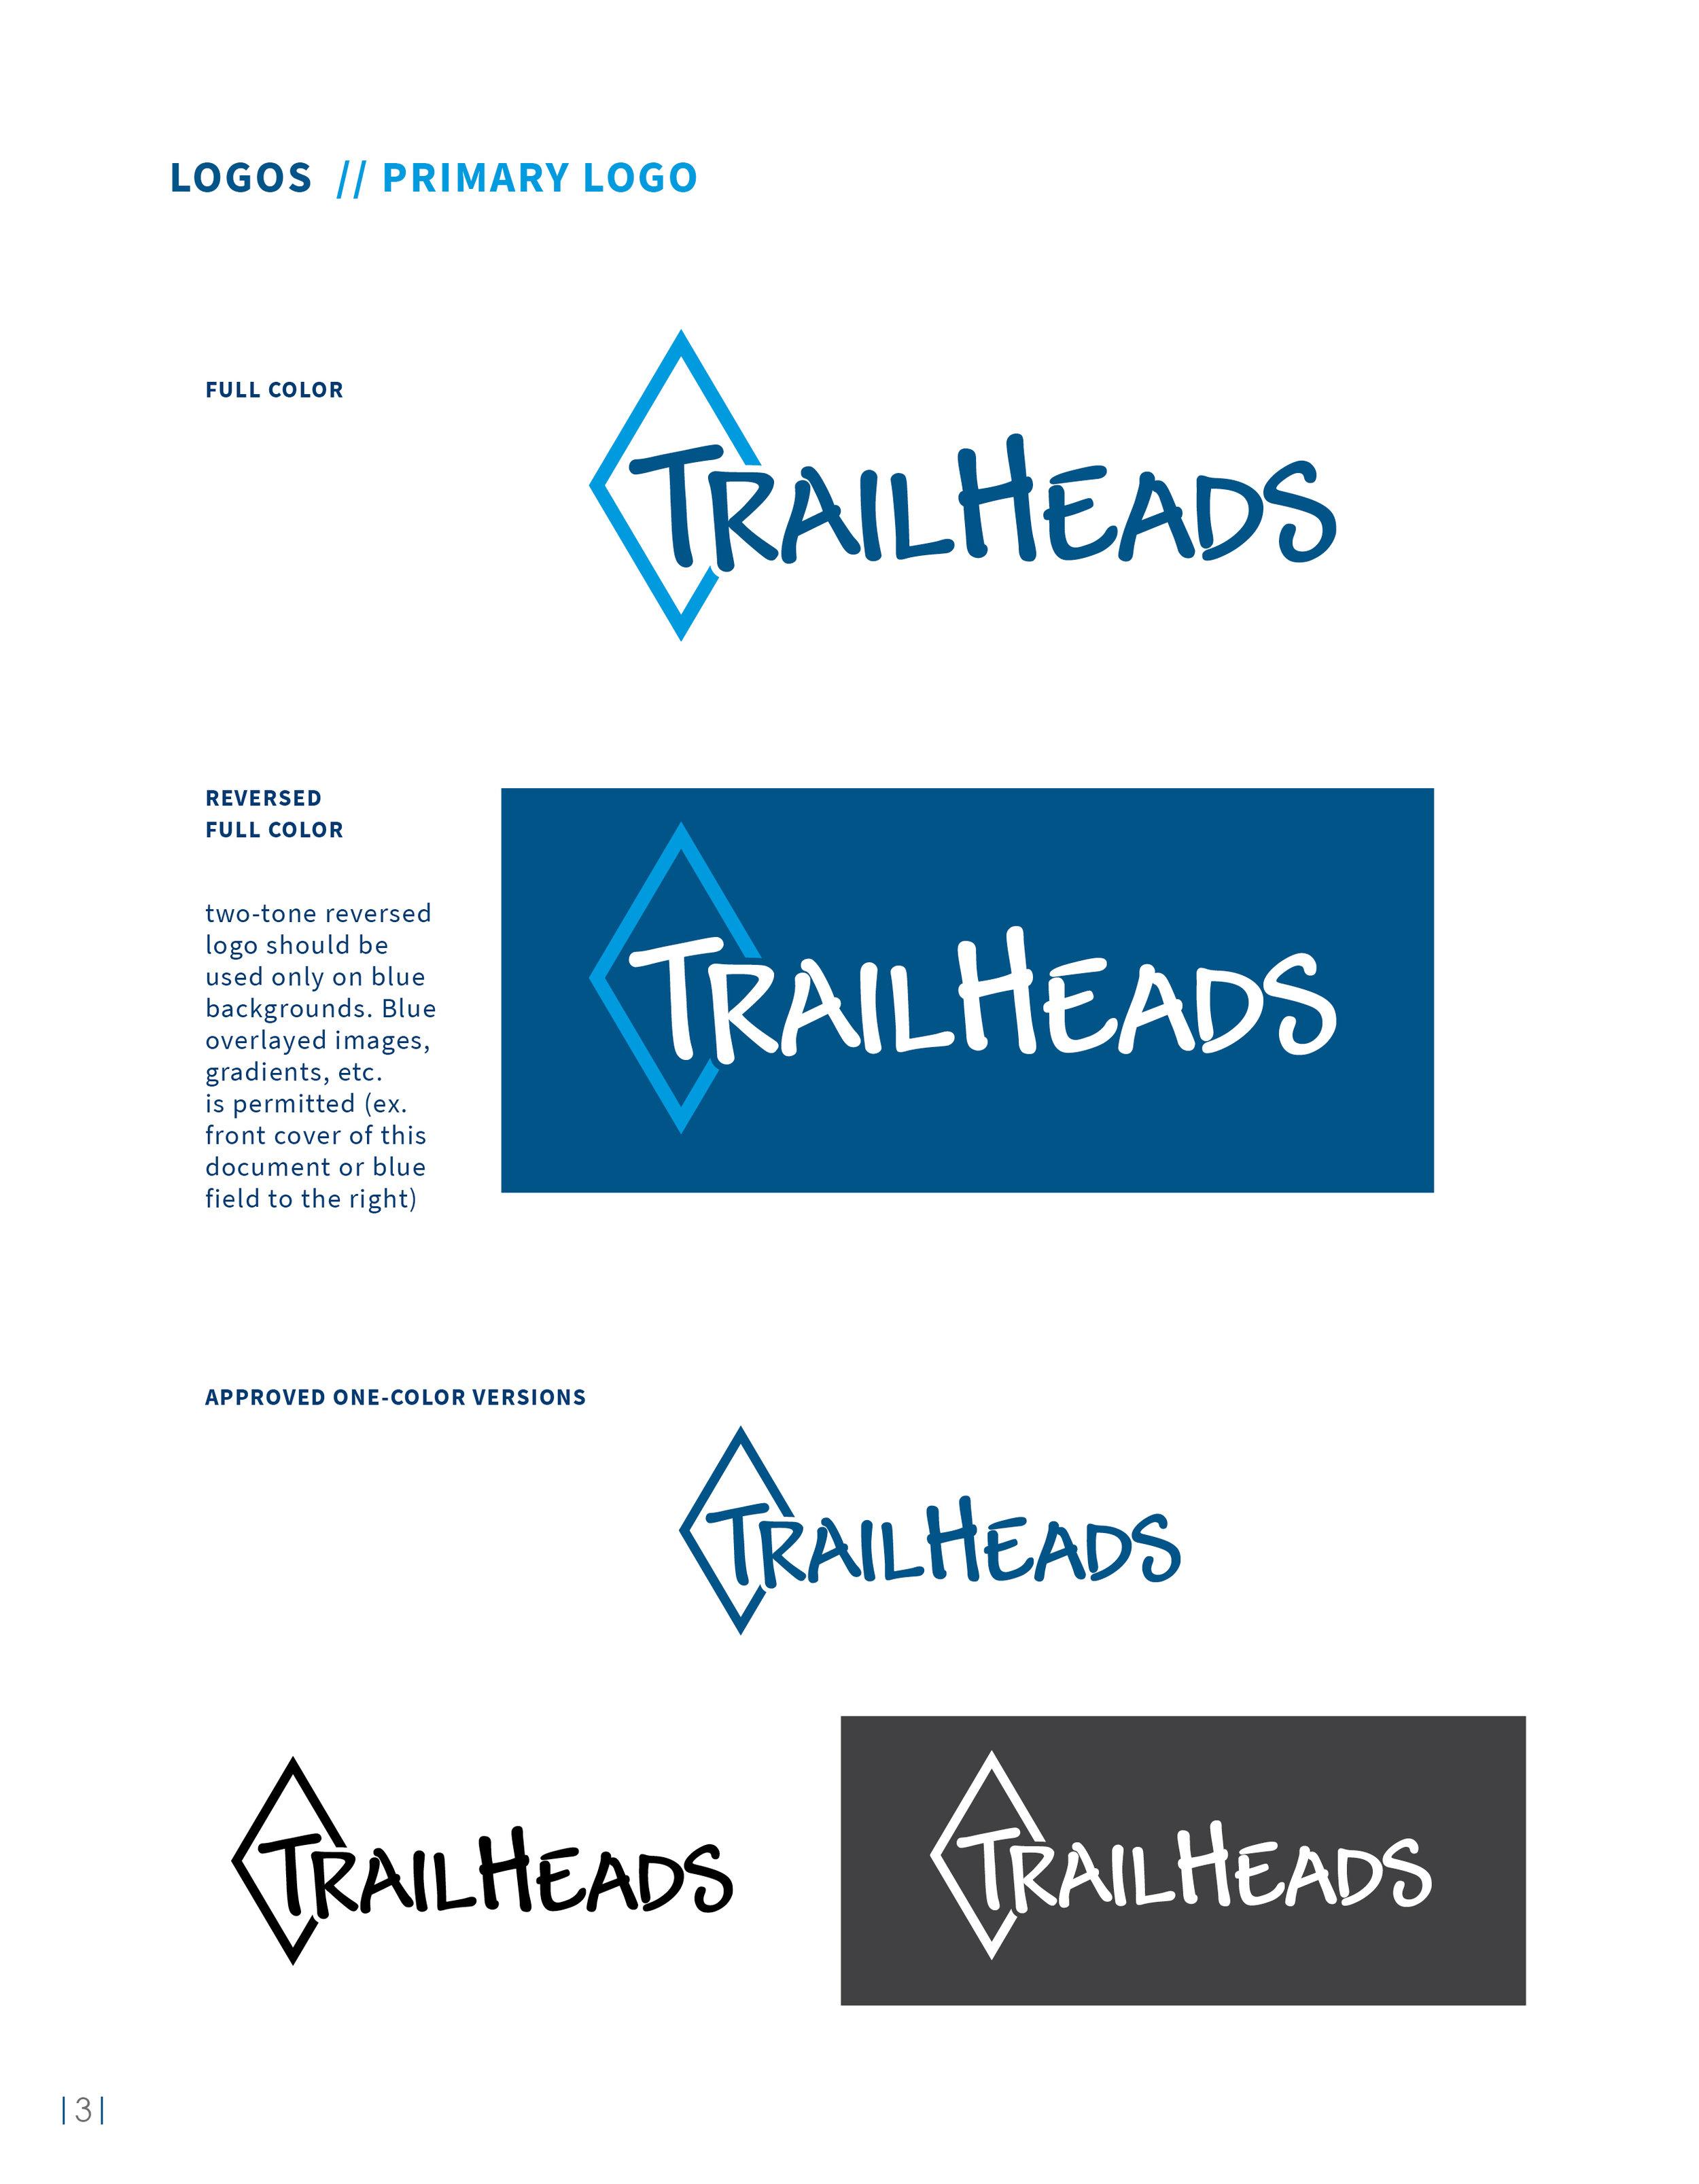 apparel-company-brand-guidelines-design-by-jordan-fretz-design-13.jpg